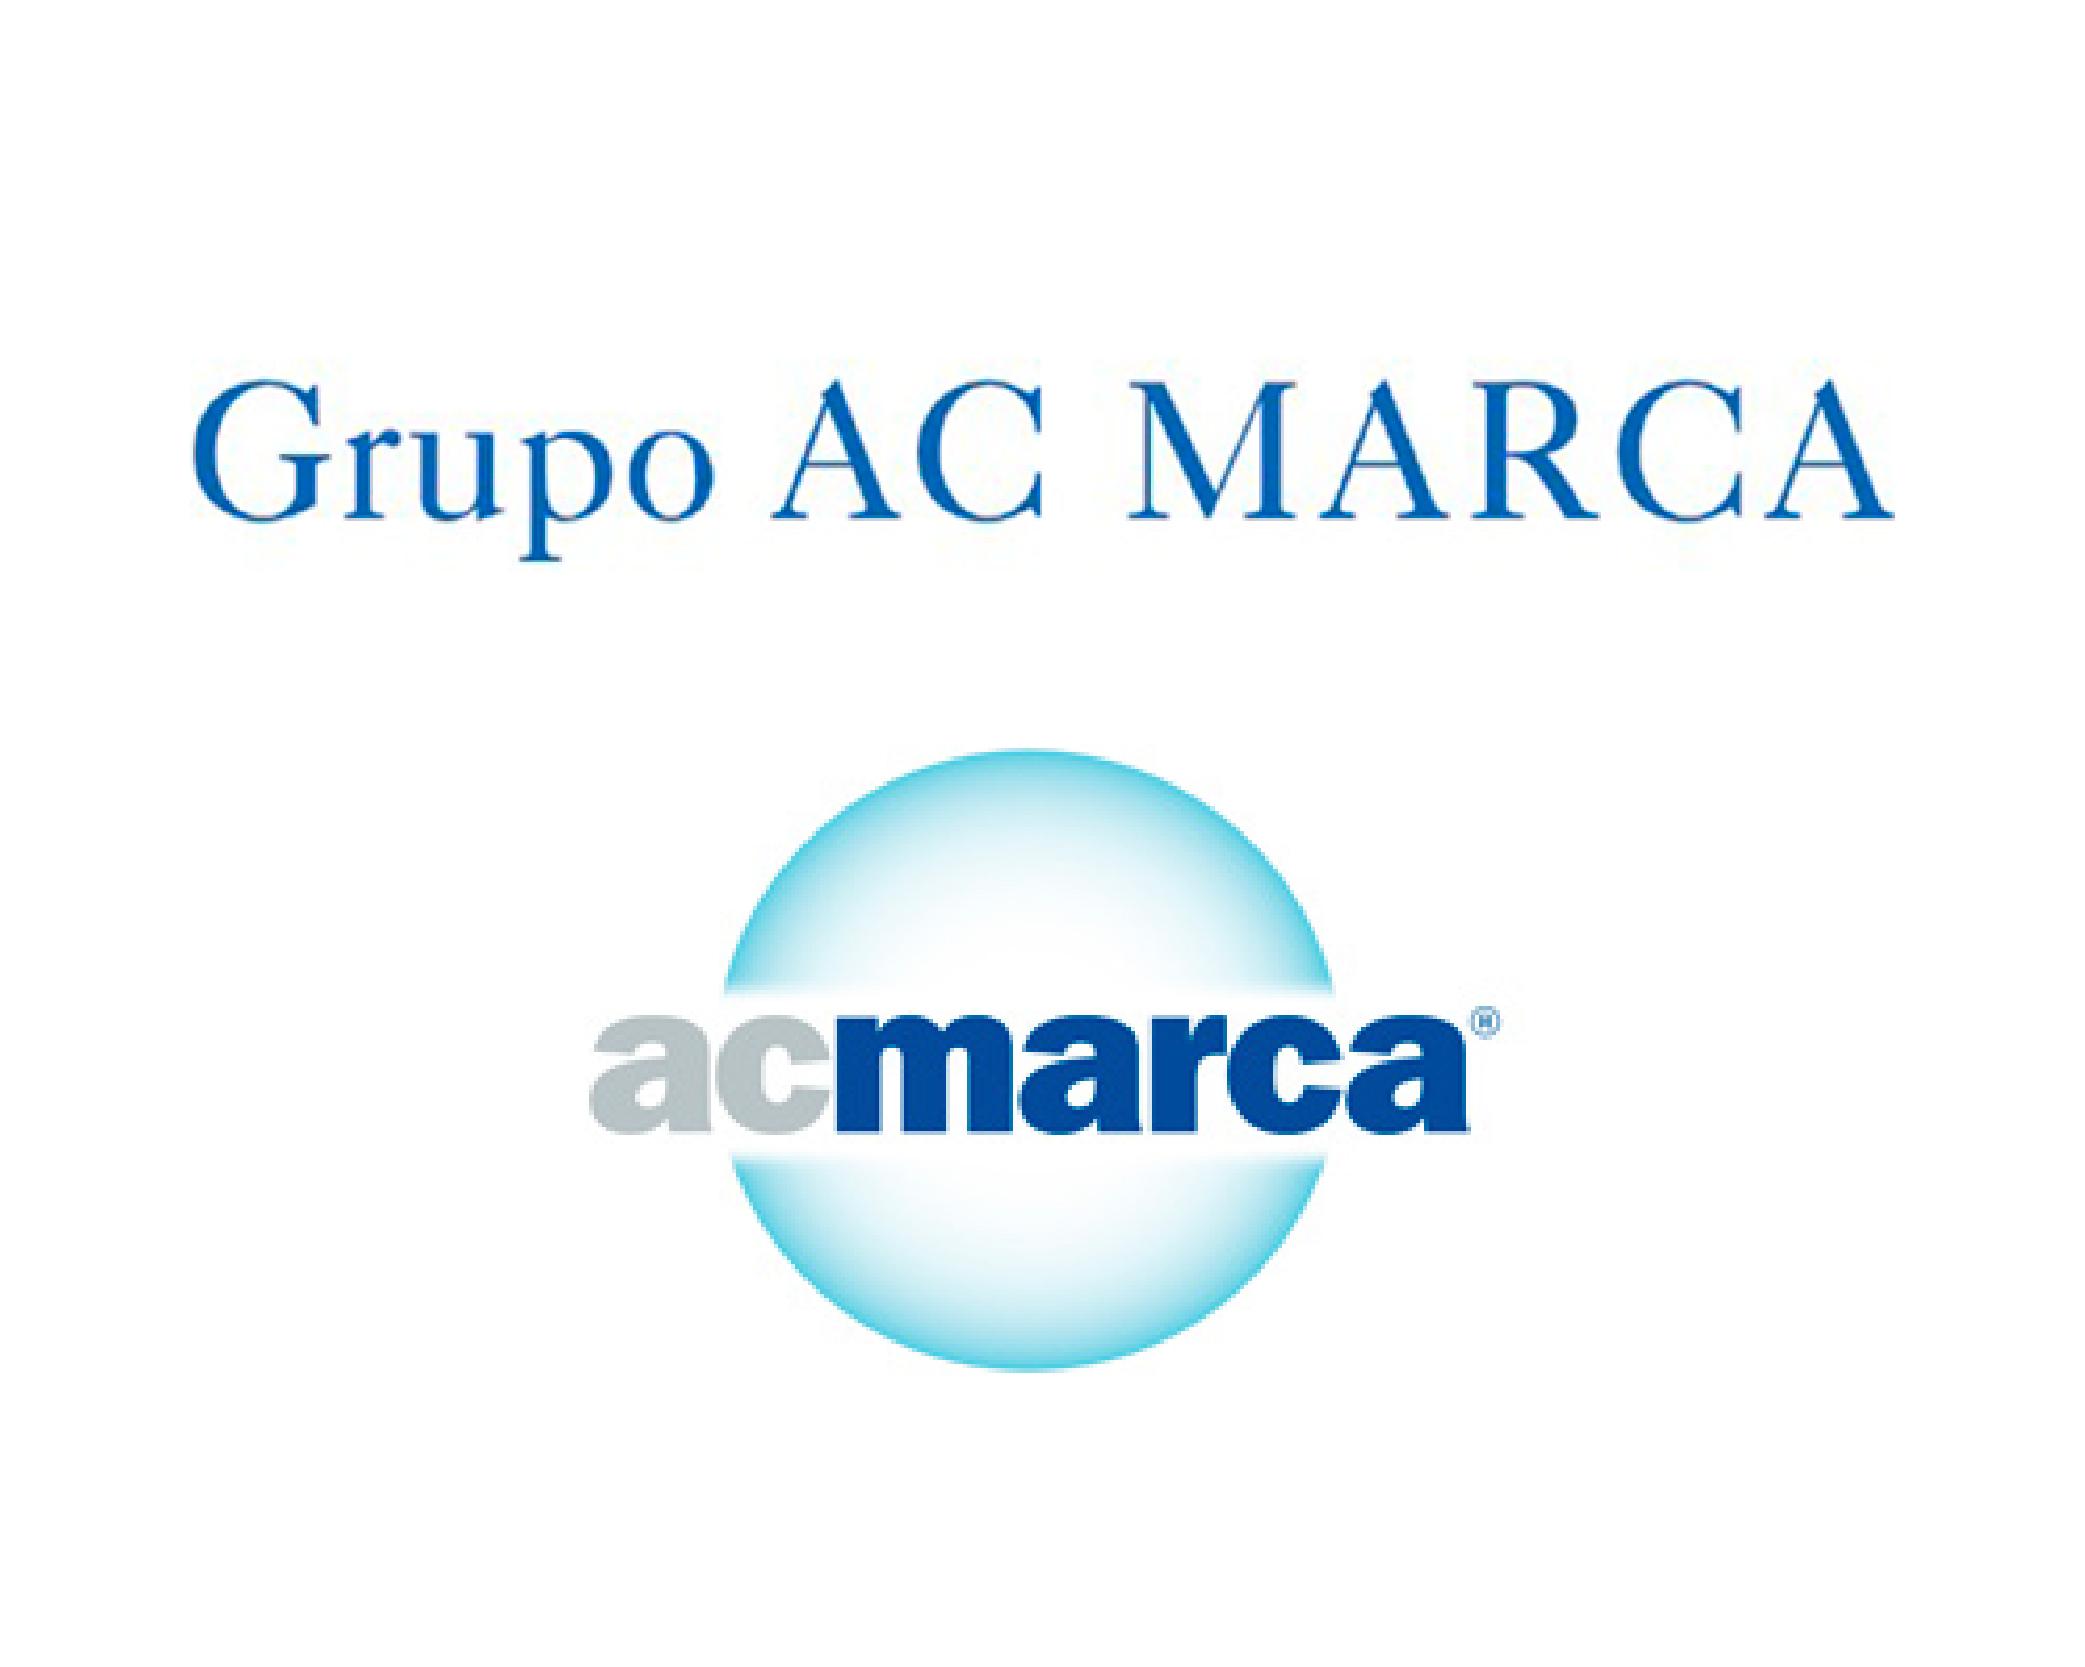 Grupo-ac-marca